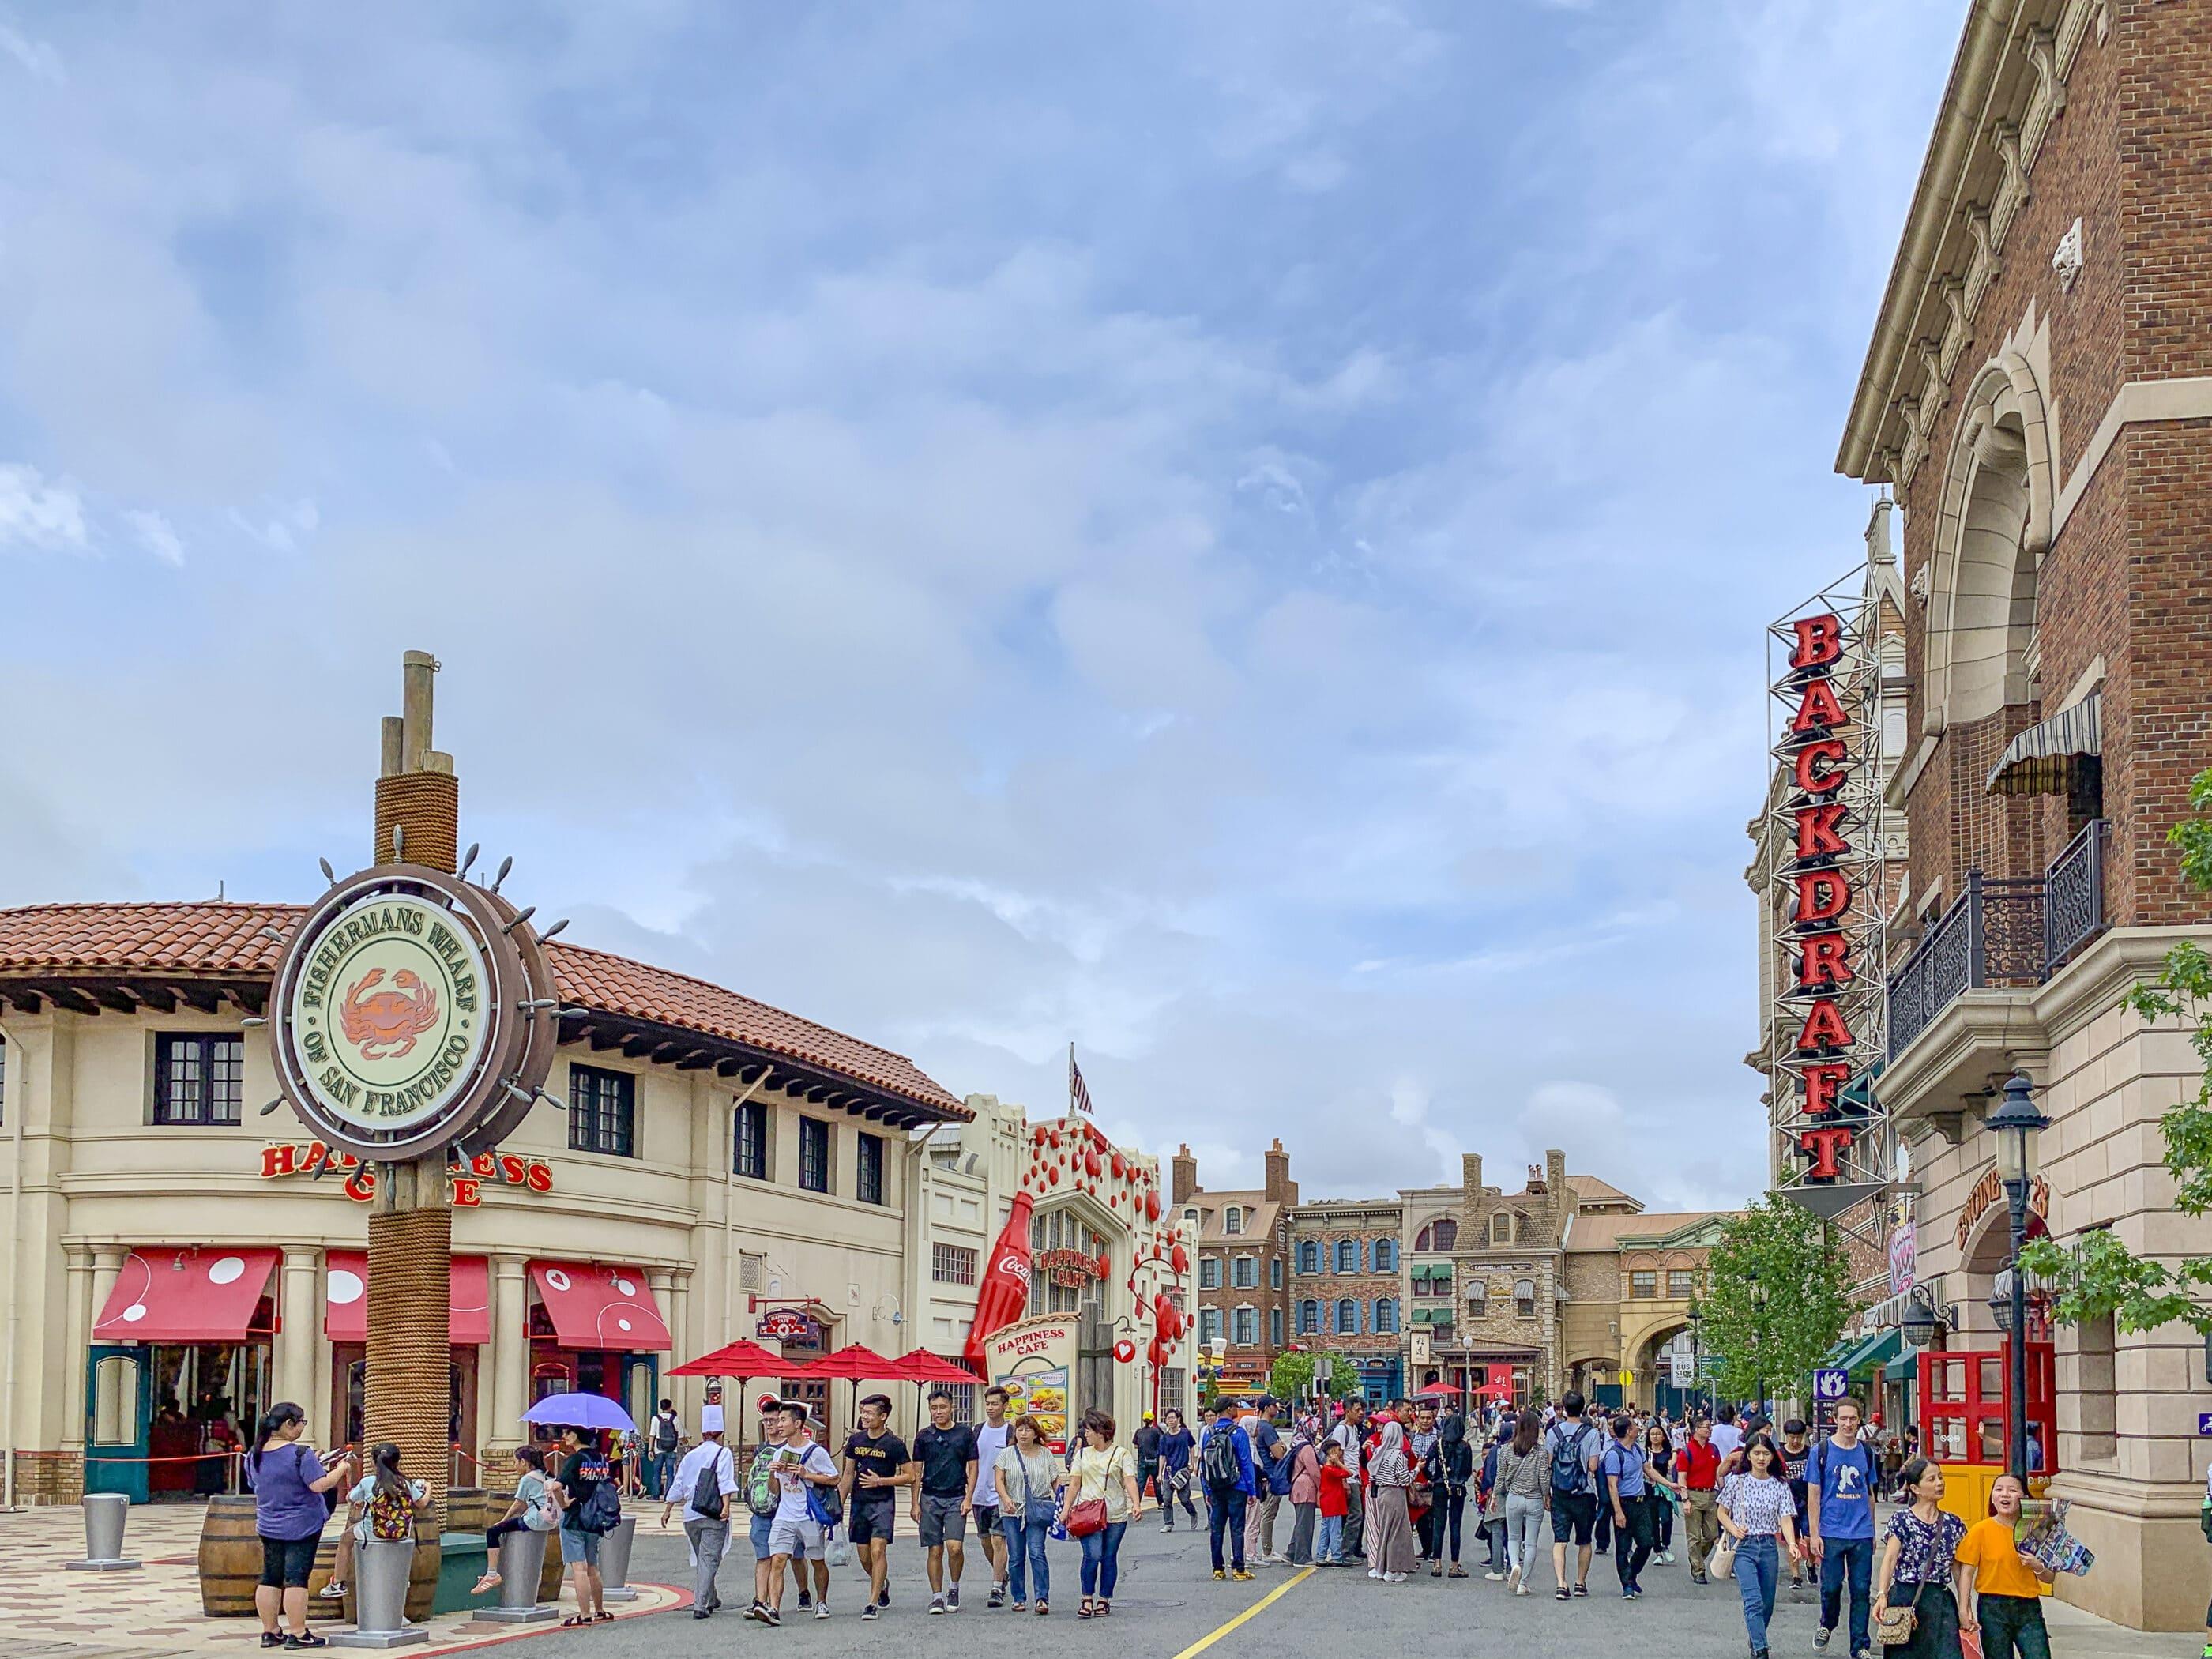 People walk down the street through San Francisco Land at Universal Studios Japan.